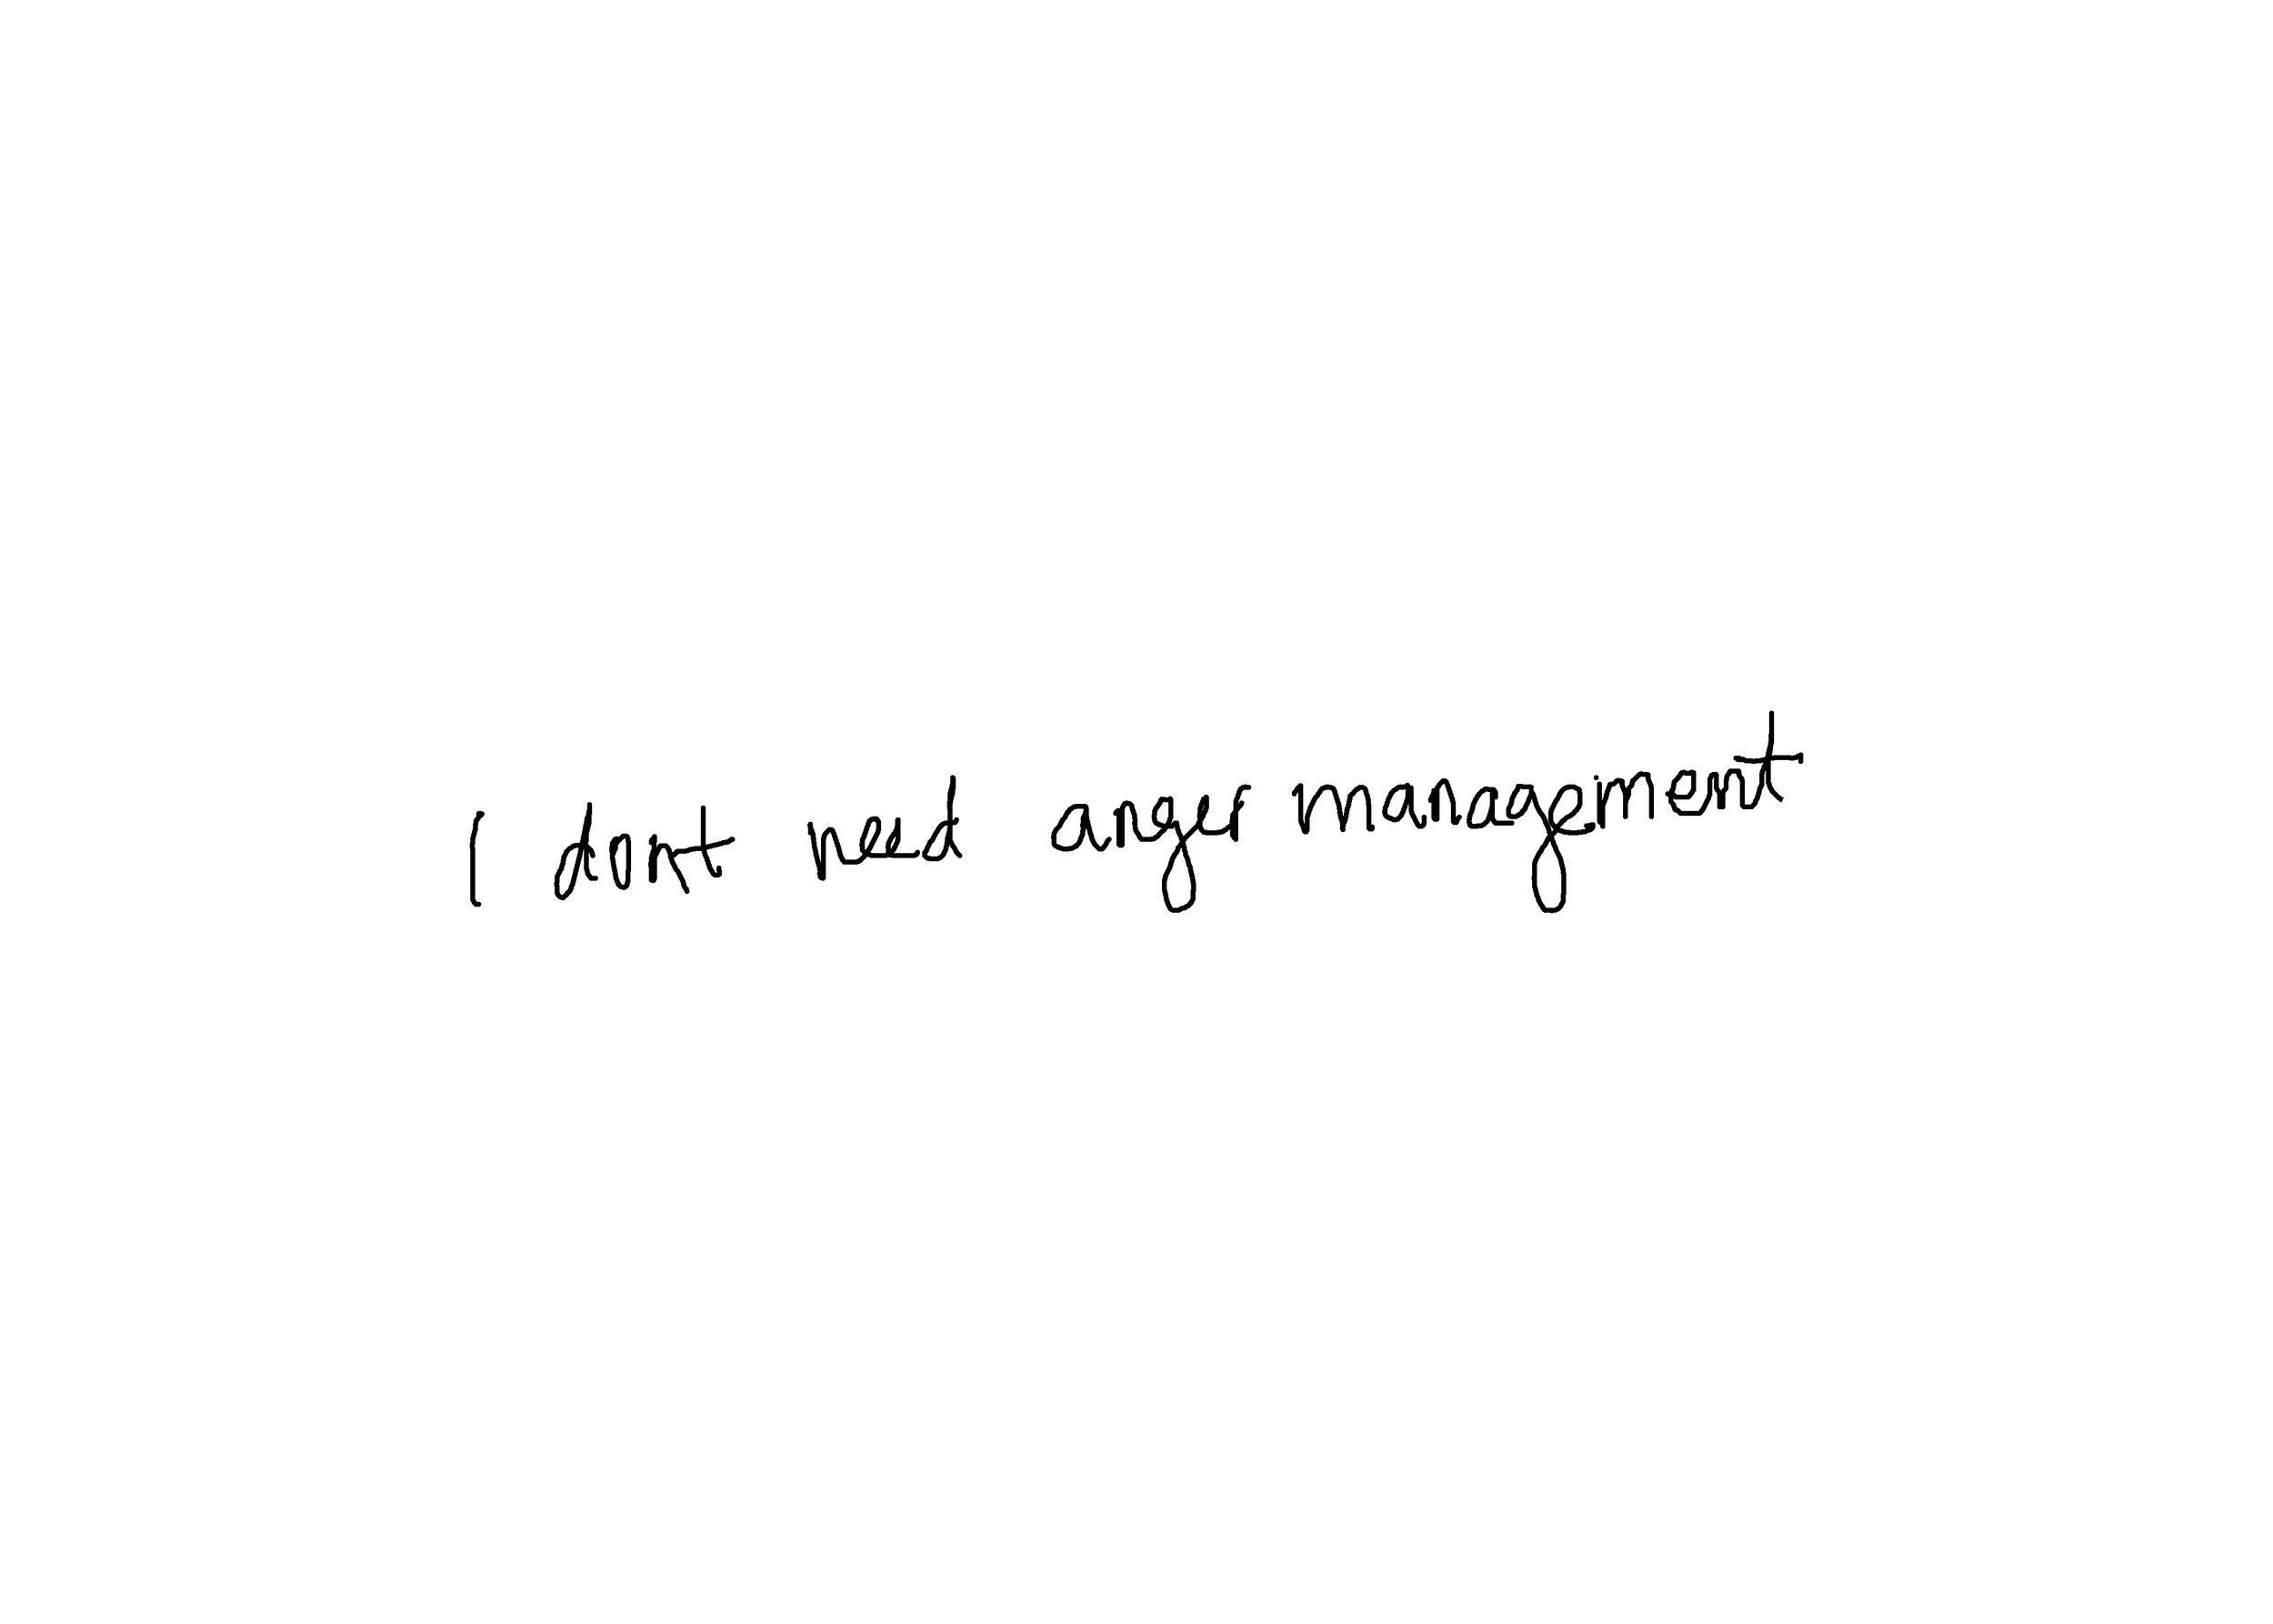 First postcard in Anger Management program